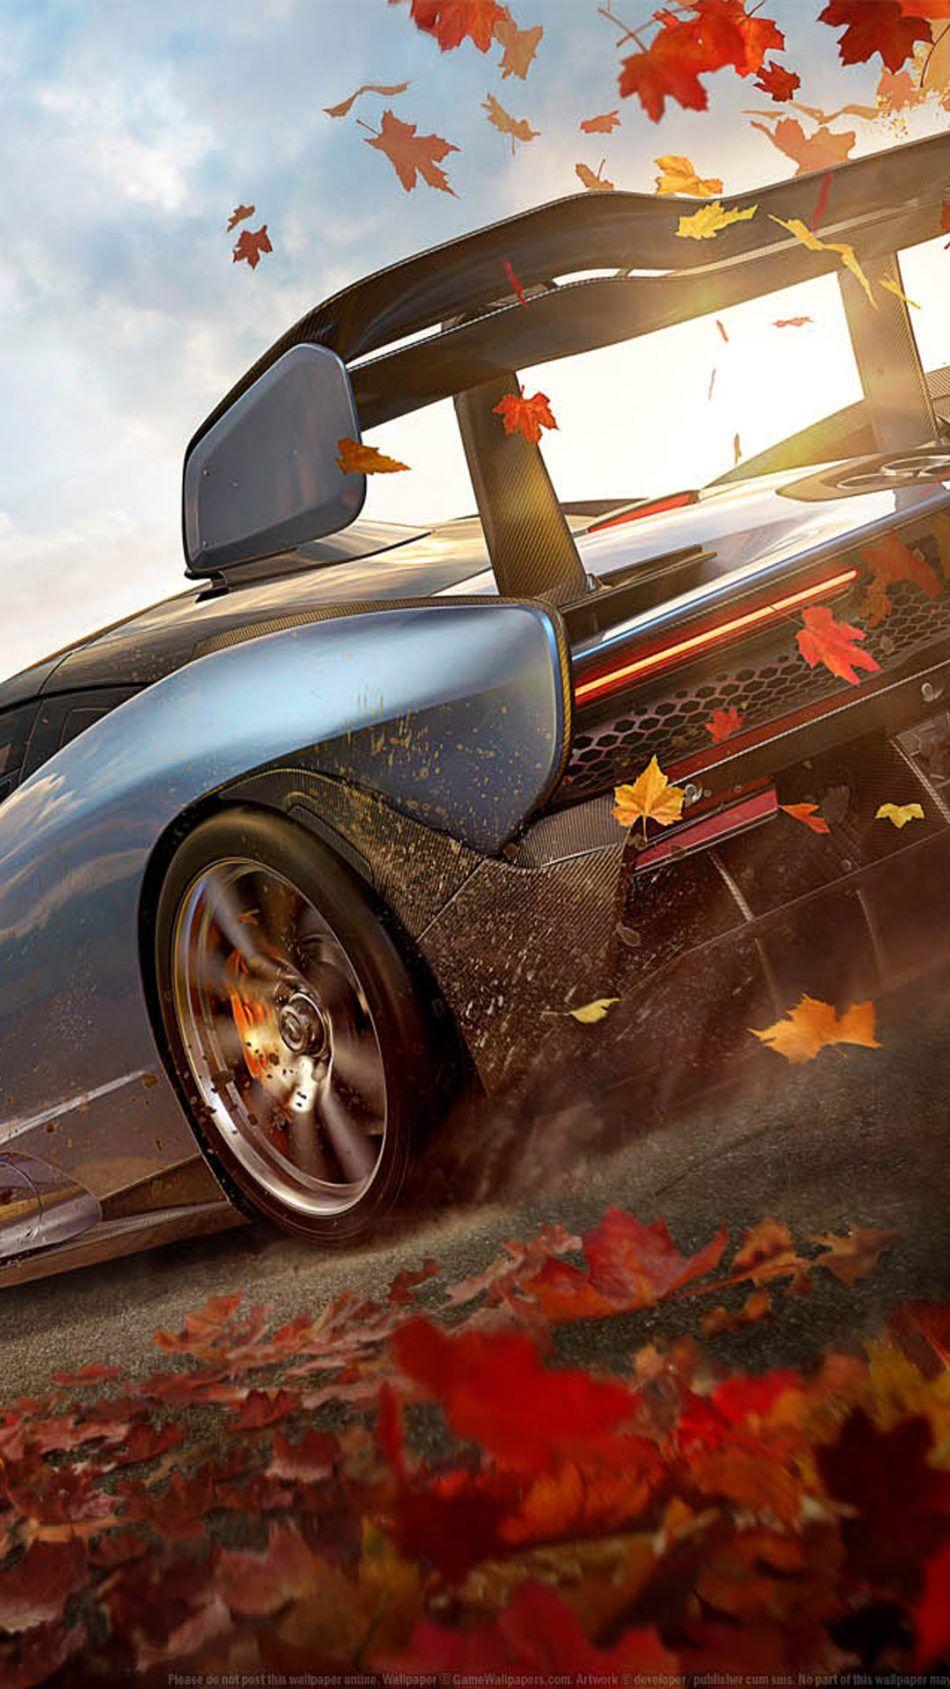 Forza Horizon 4 4k Ultra Hd Mobile Wallpaper Forza Horizon 4 Car Iphone Wallpaper Forza